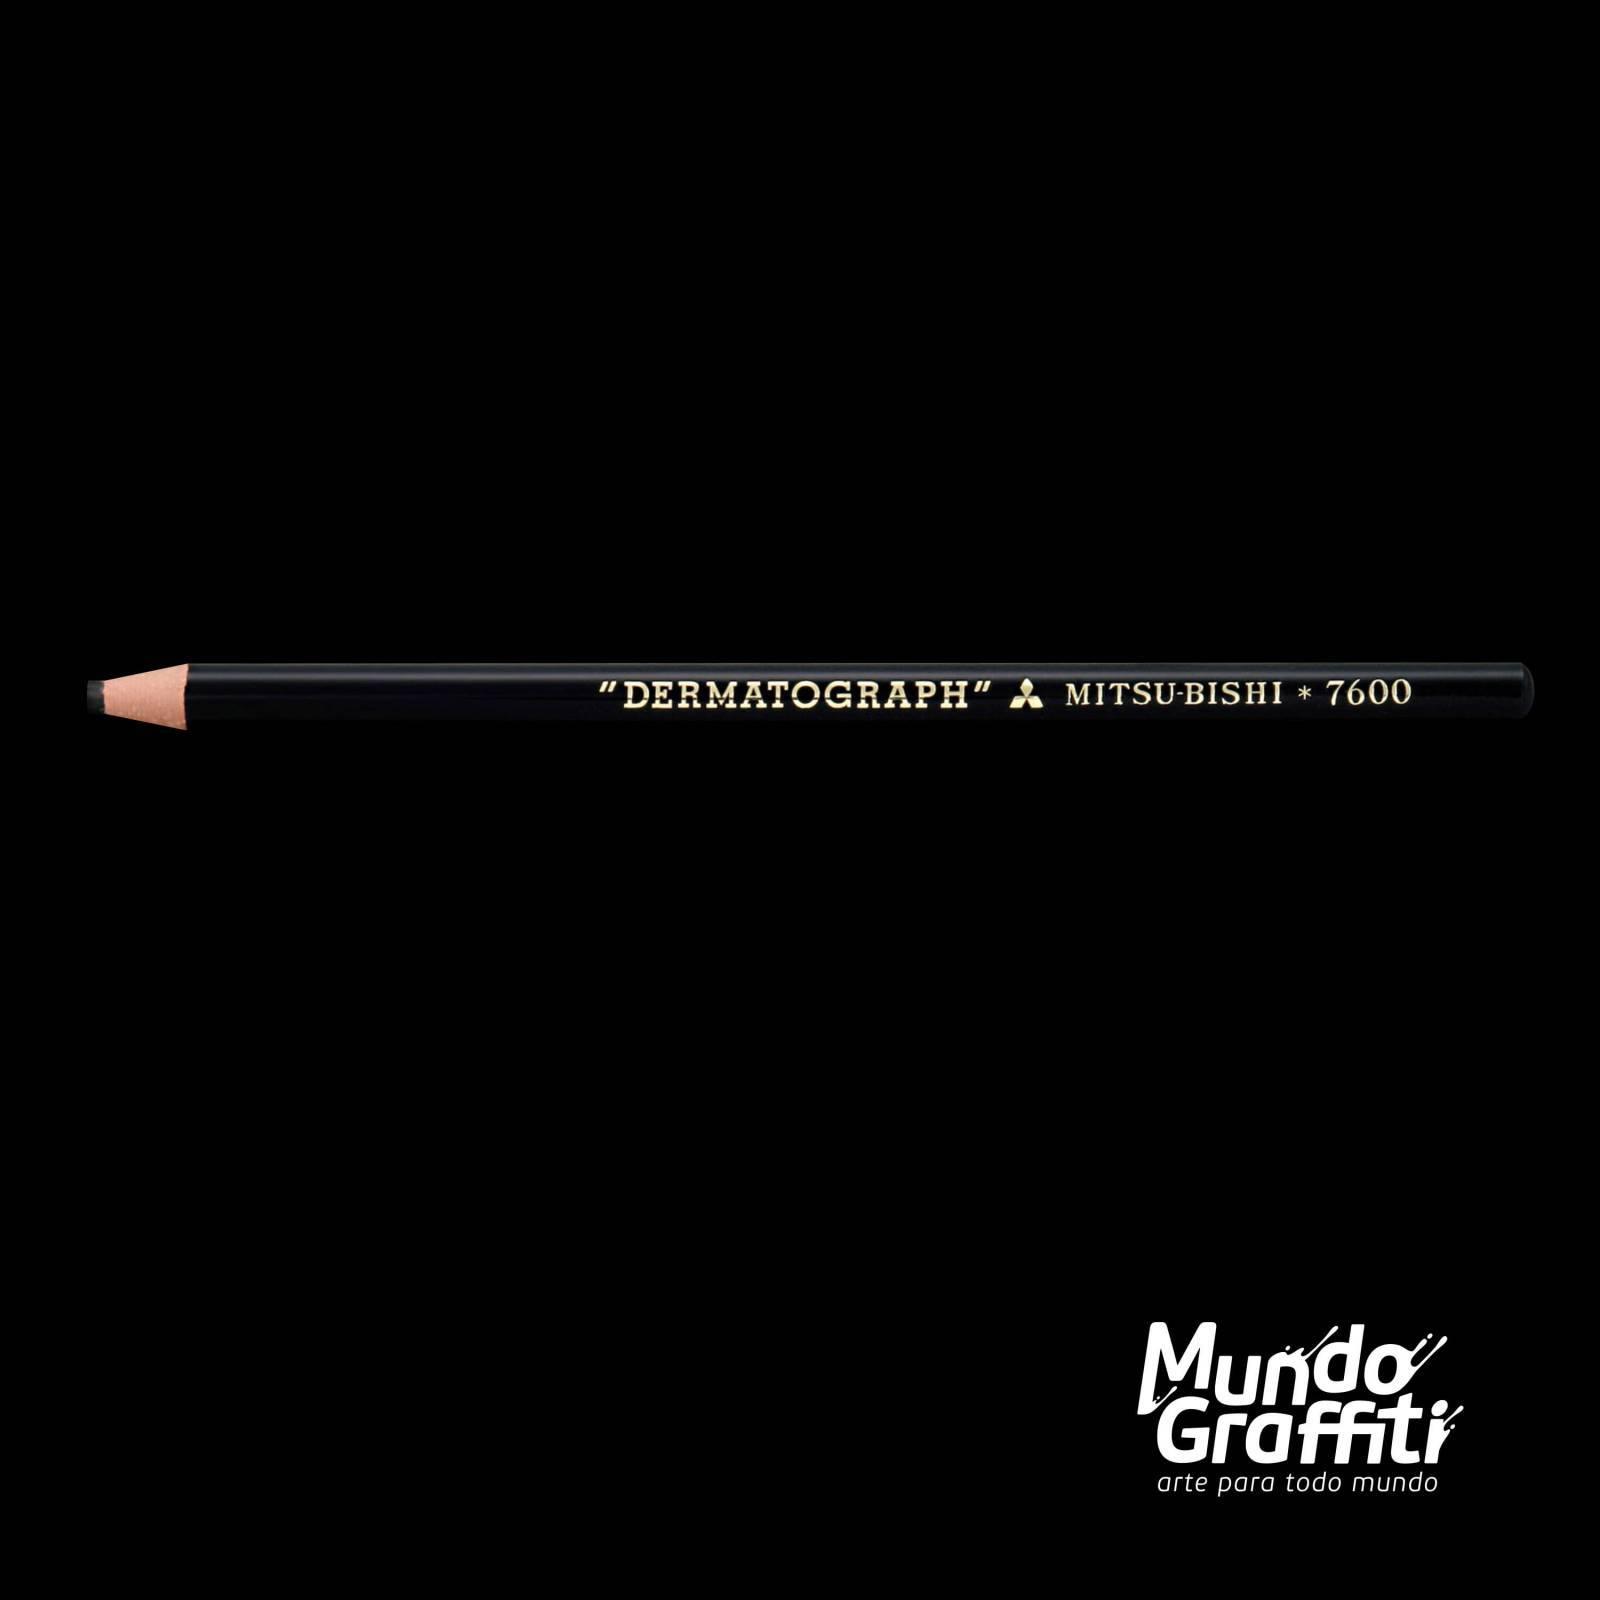 Lápis Dermatográfico Mitsubishi Preto - Mundo Graffiti